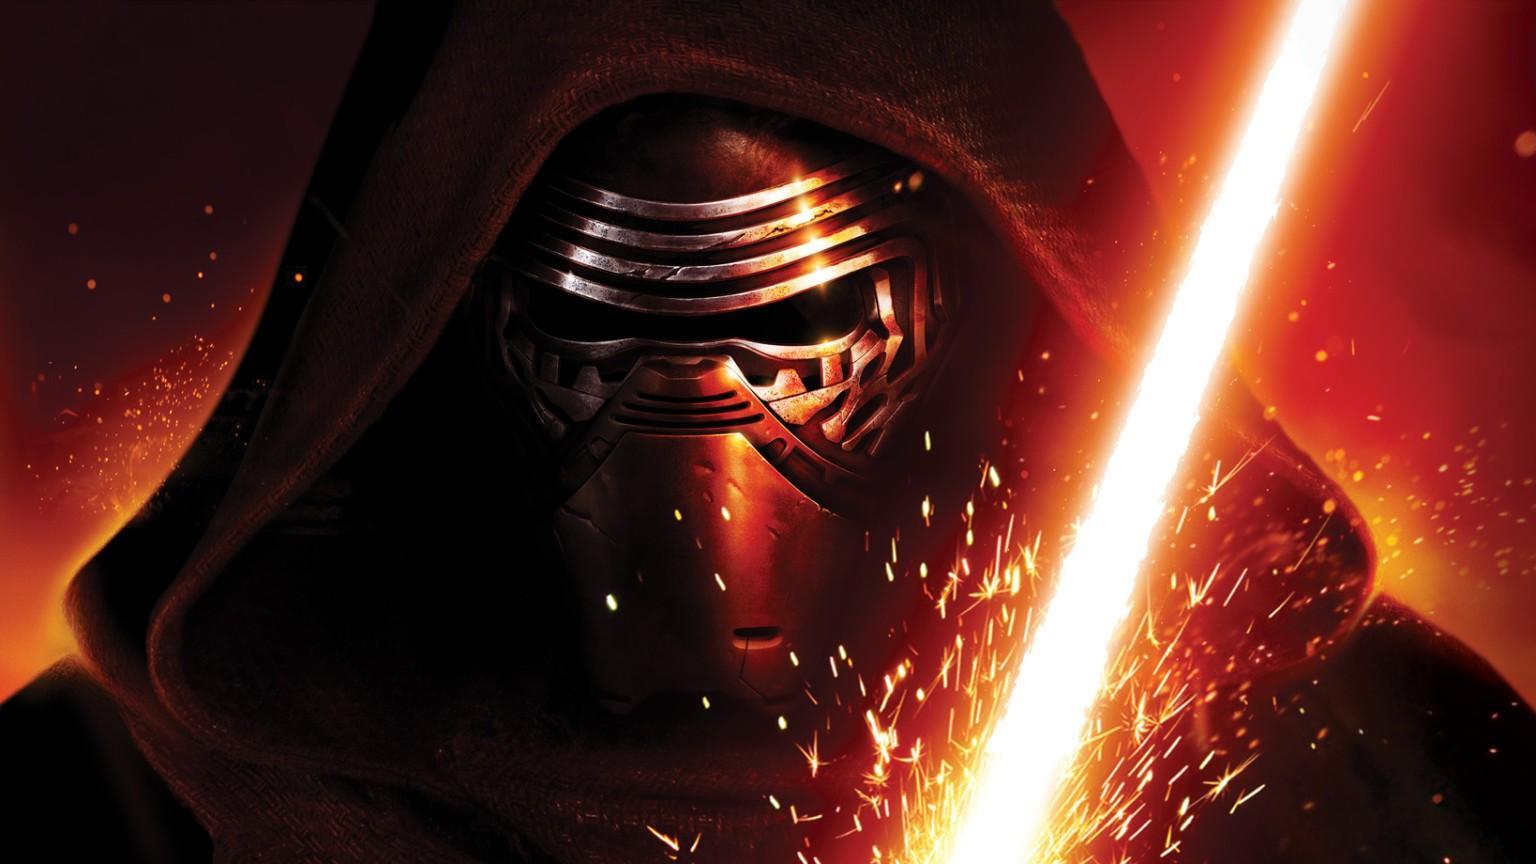 Free Download Kylo Ren The Force Awakens Wallpapers Hd